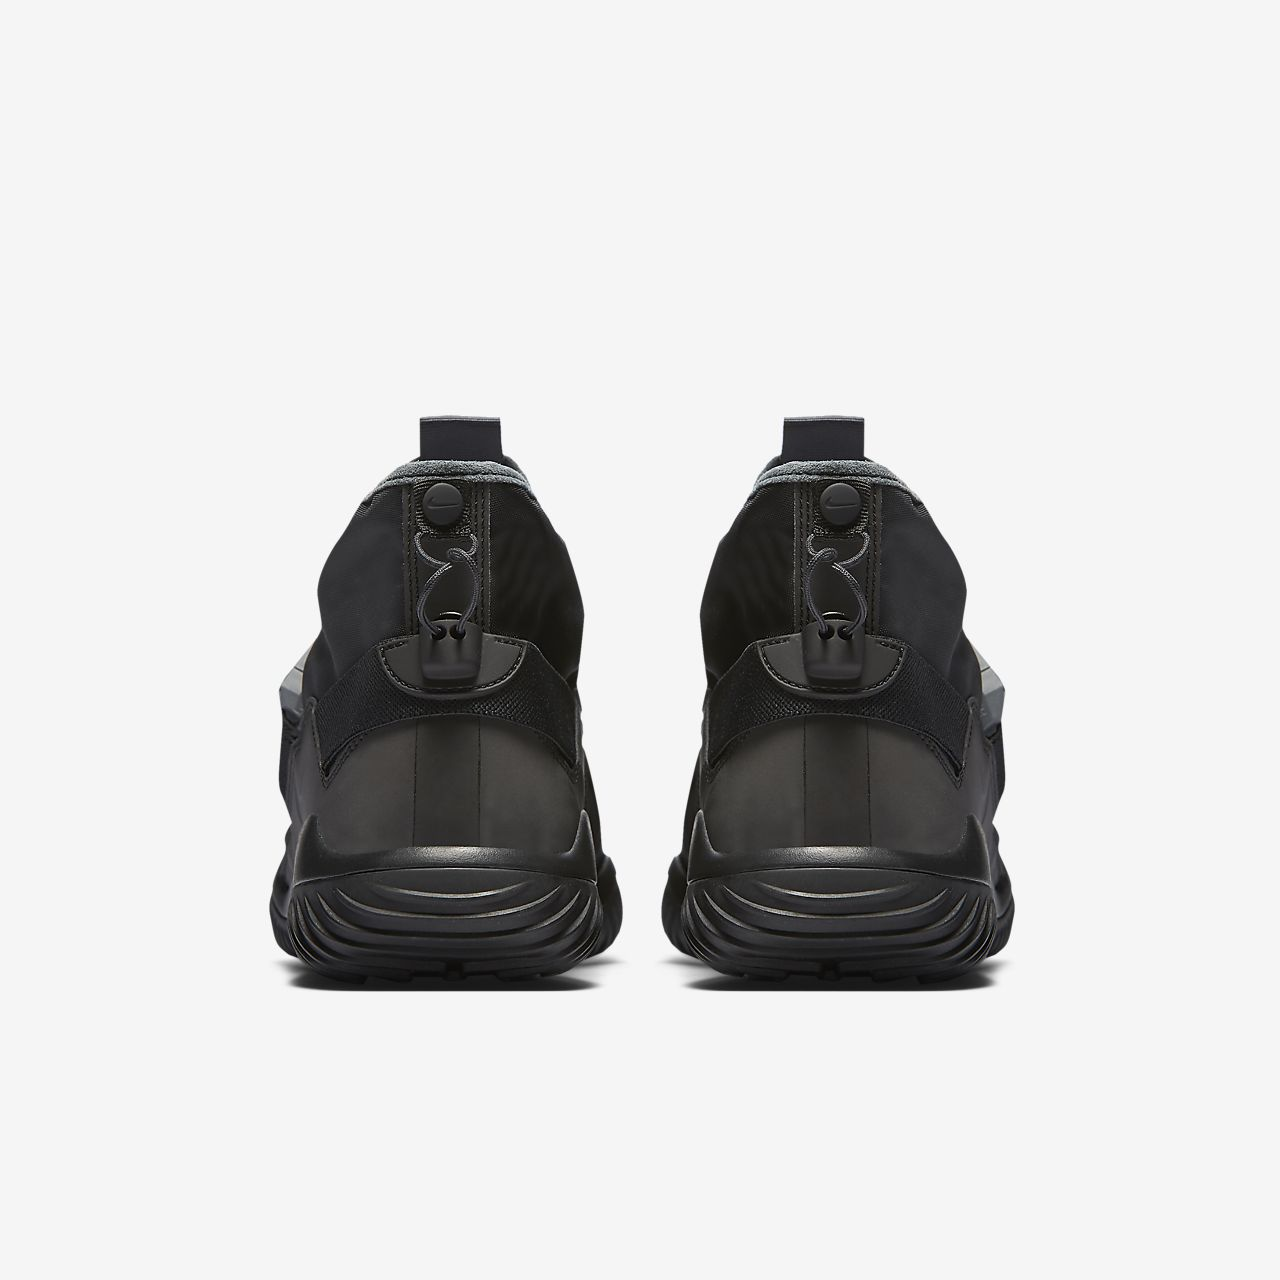 Nike Komyuter Sneakers Gr. US 10 YRiGOIwGD7